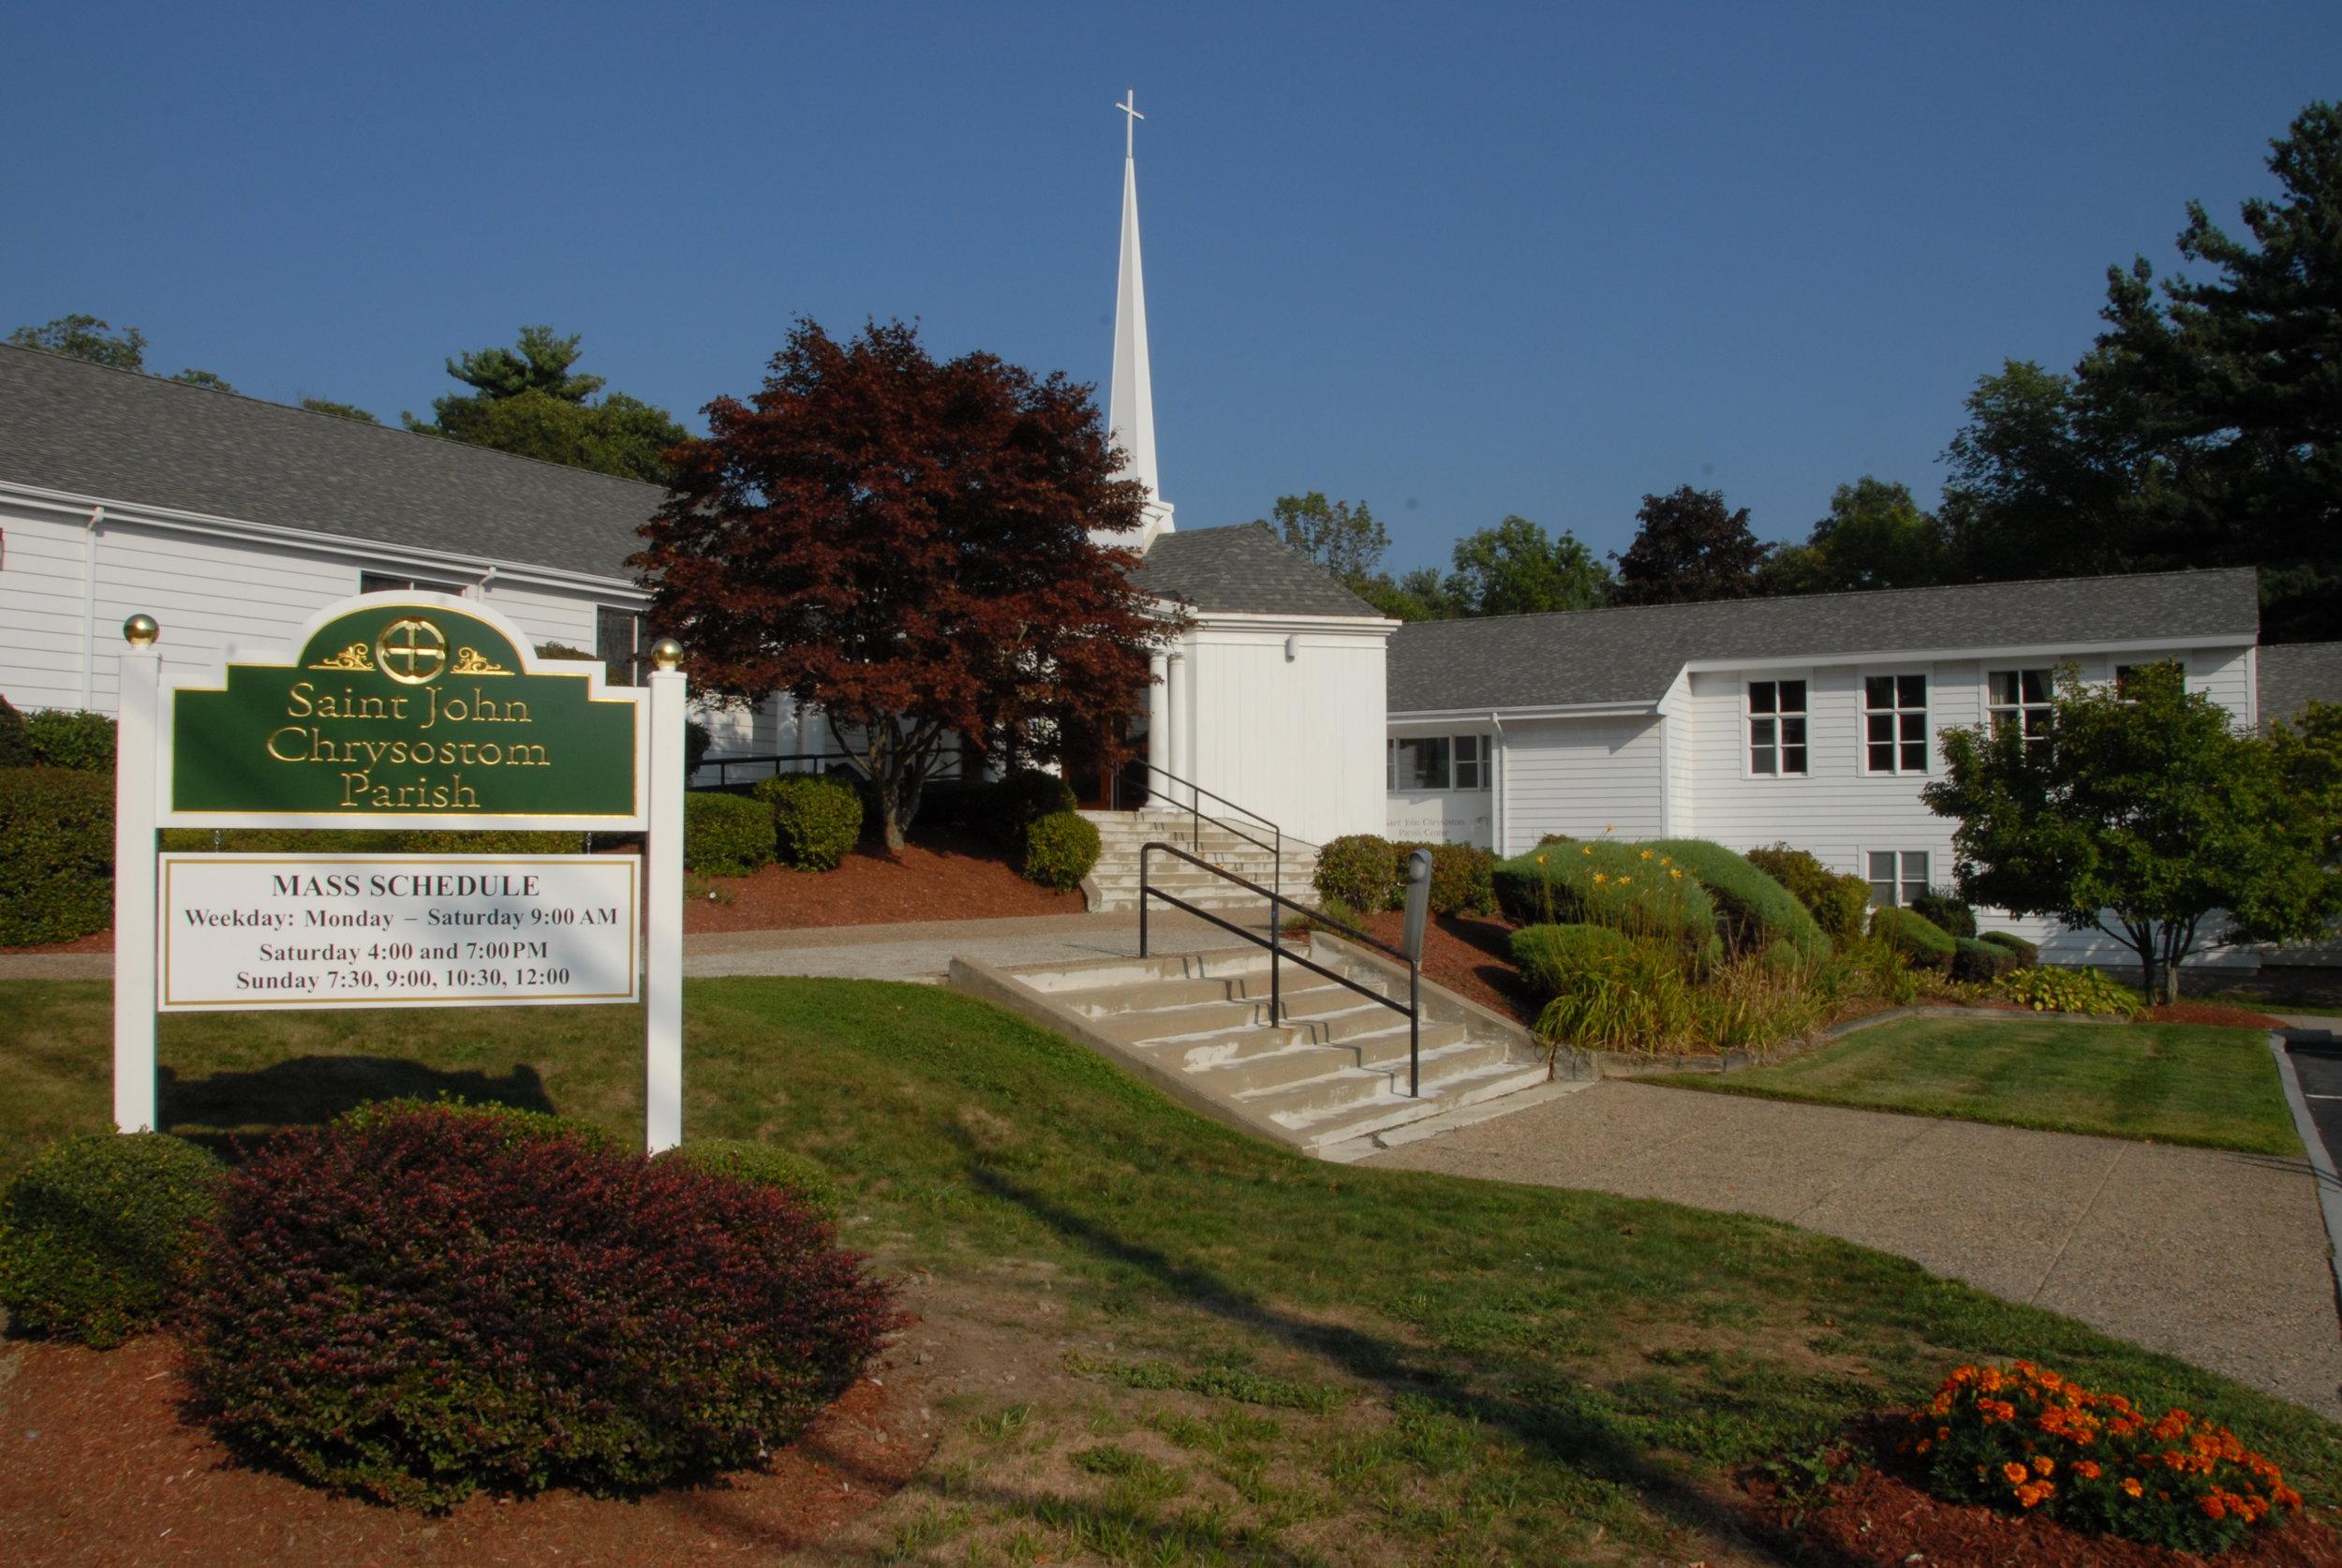 St. John Chrysostom Parish - West Roxbury, MA